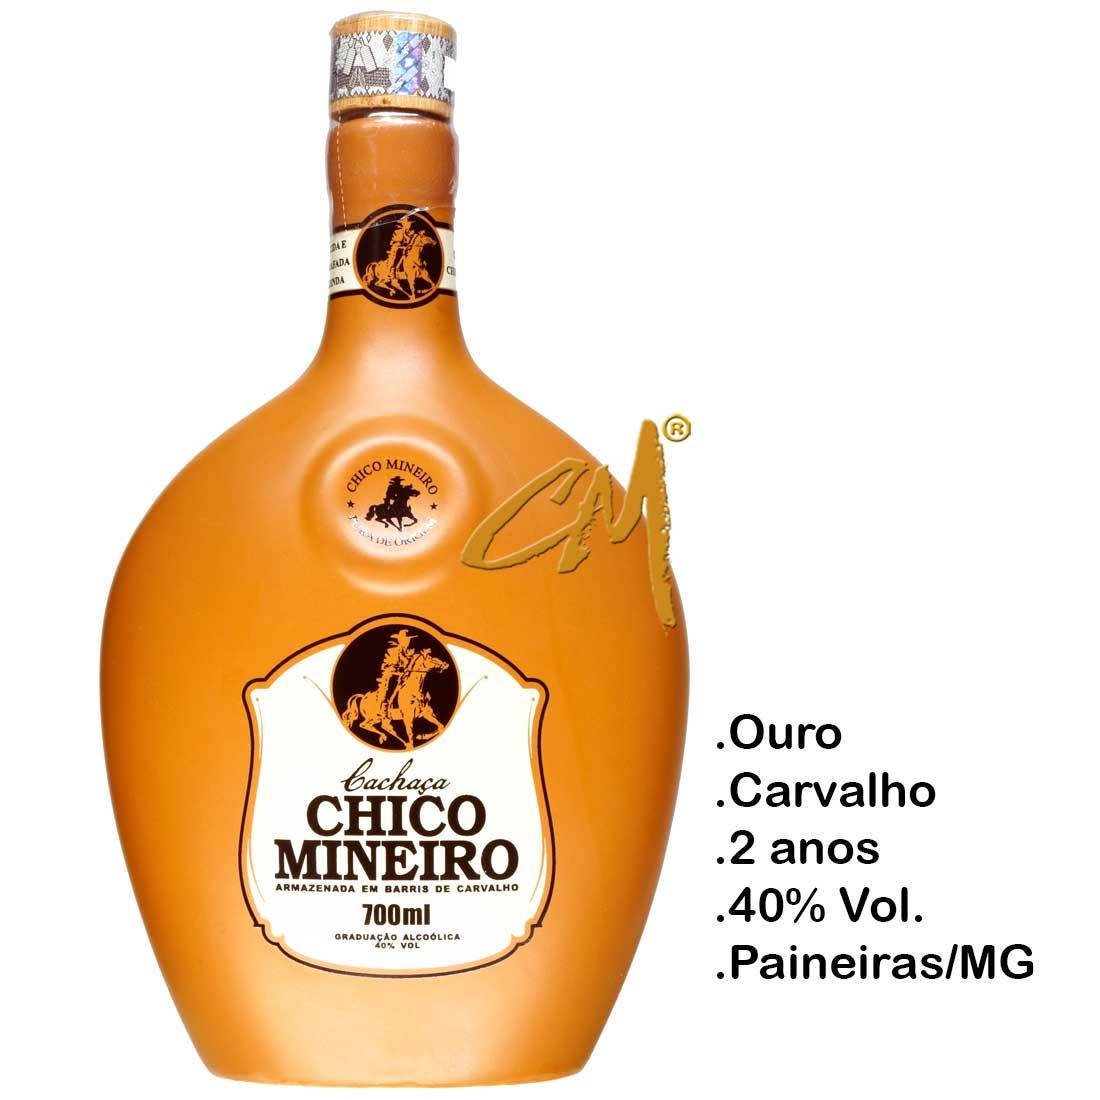 Cachaça Chico Mineiro Ouro Barro Ovalada 700 ml (Abaeté - MG)